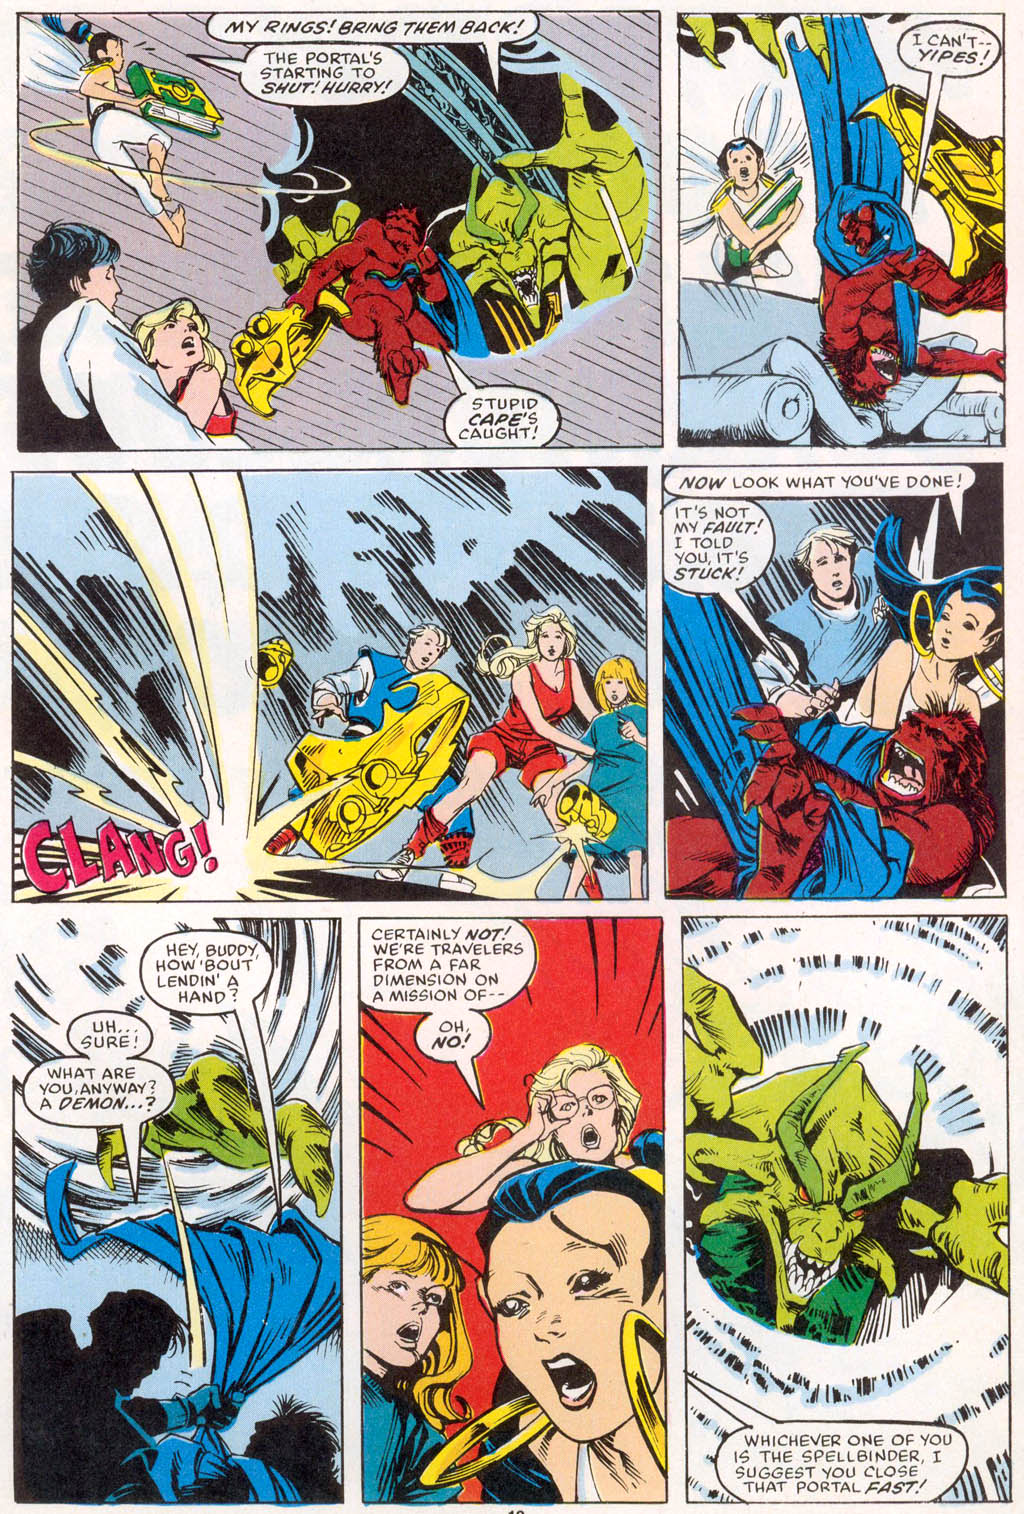 Read online Spellbound comic -  Issue #1 - 13